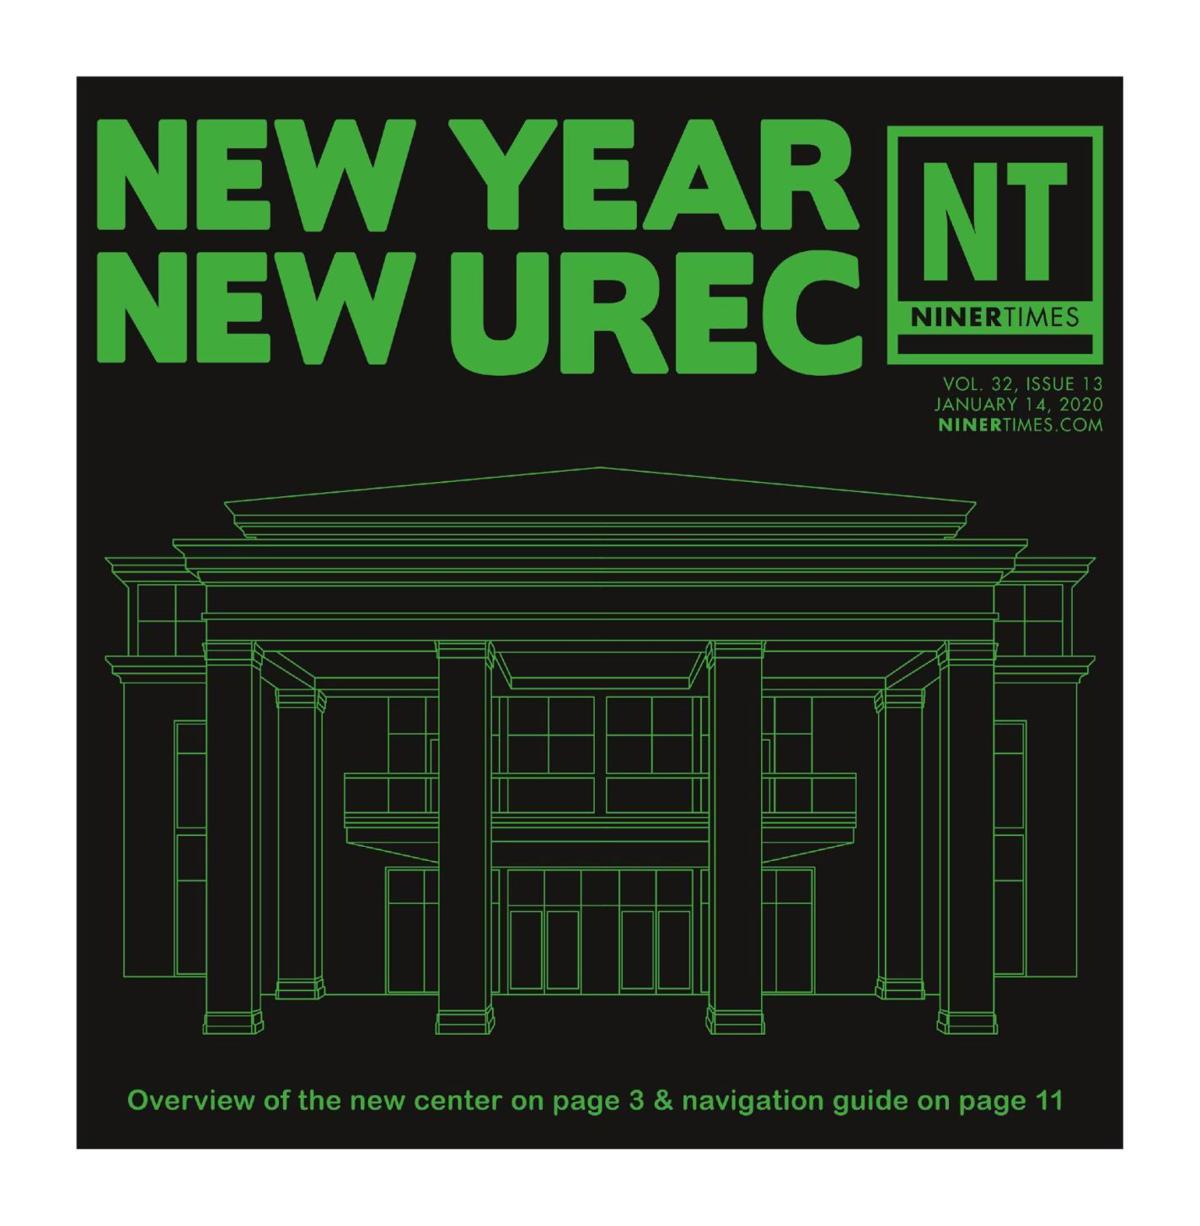 Niner Times: January 14, 2020